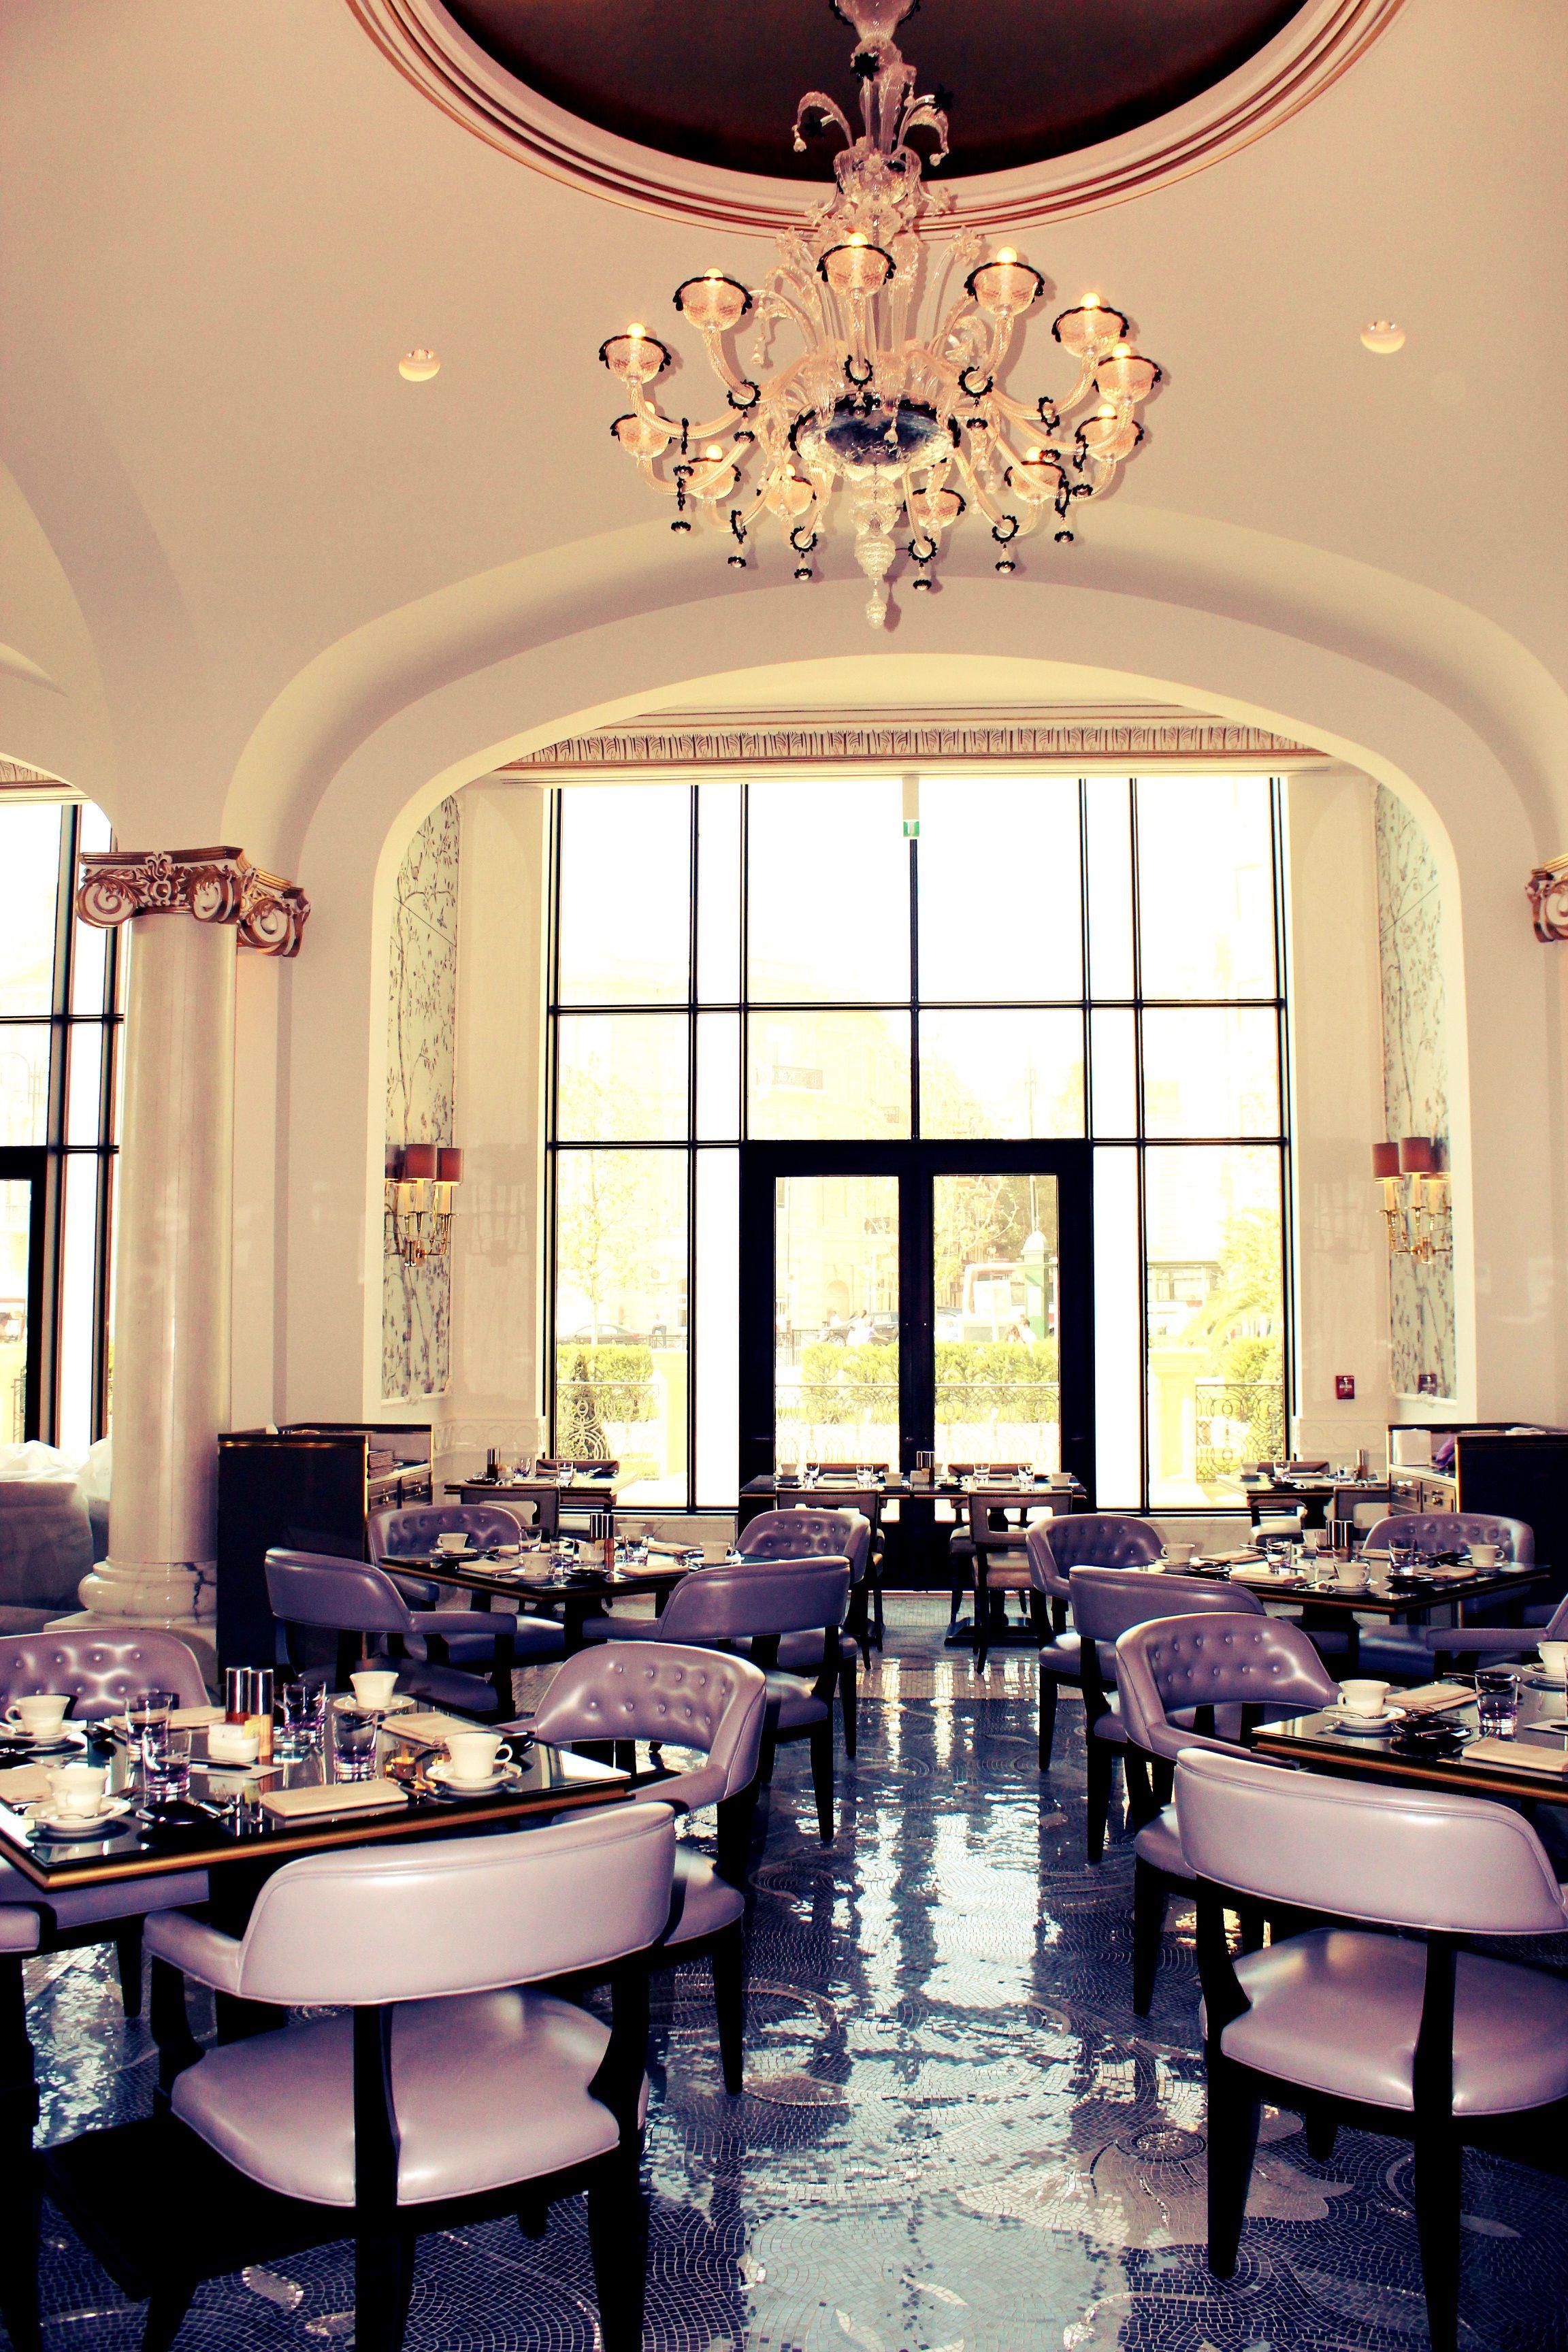 Zafferano Baku Italian Restaurant Four Seasons Hotel Baku Restaurant Restaurant Design Cafe Restaurant